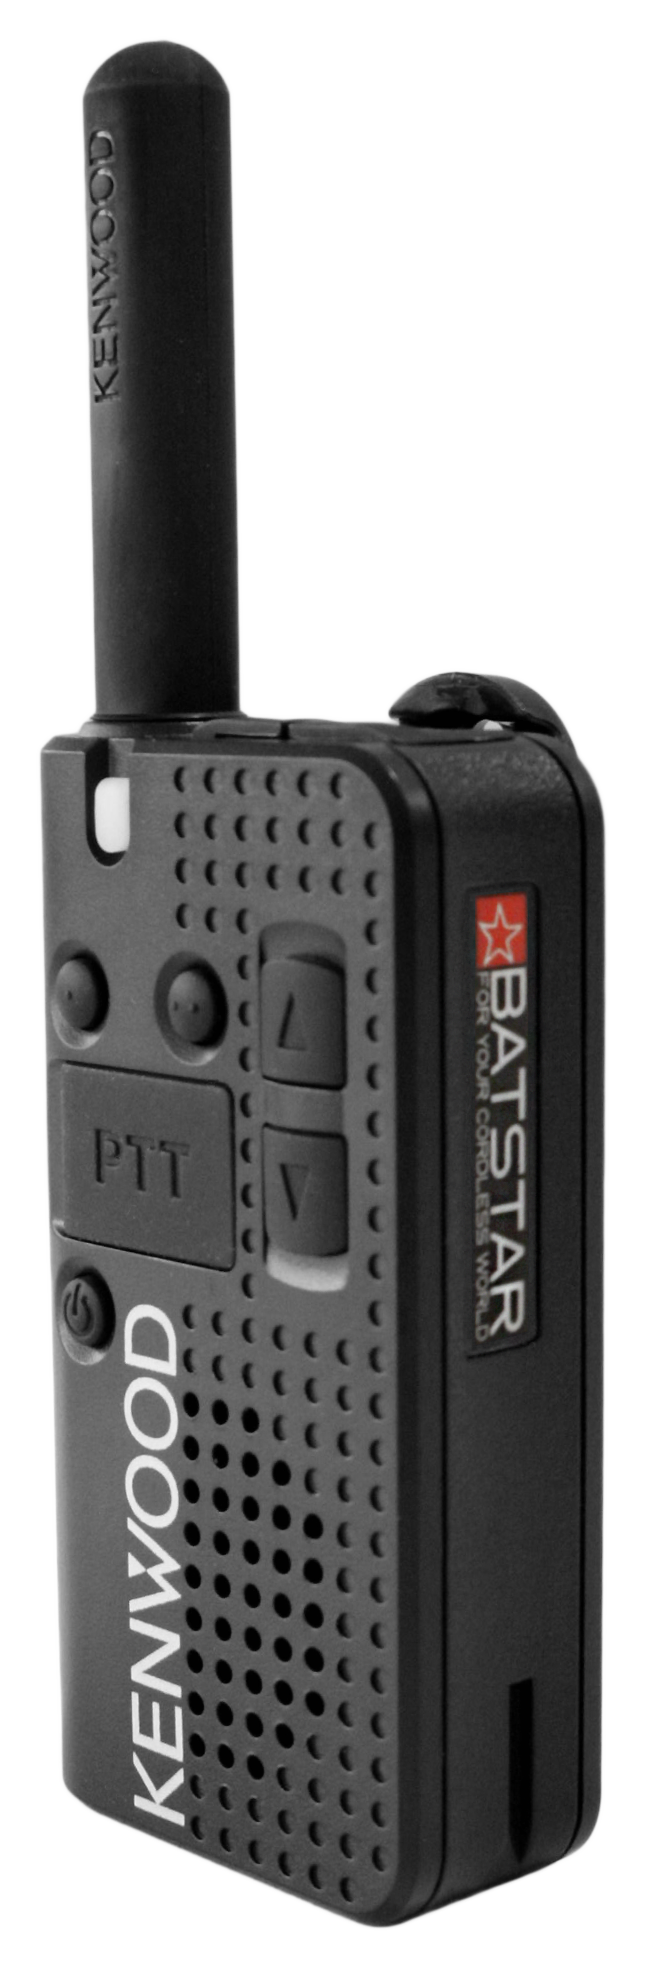 PKT-23 - Kenwood BATSTAR GmbH Filialfunk Team Kommunikation